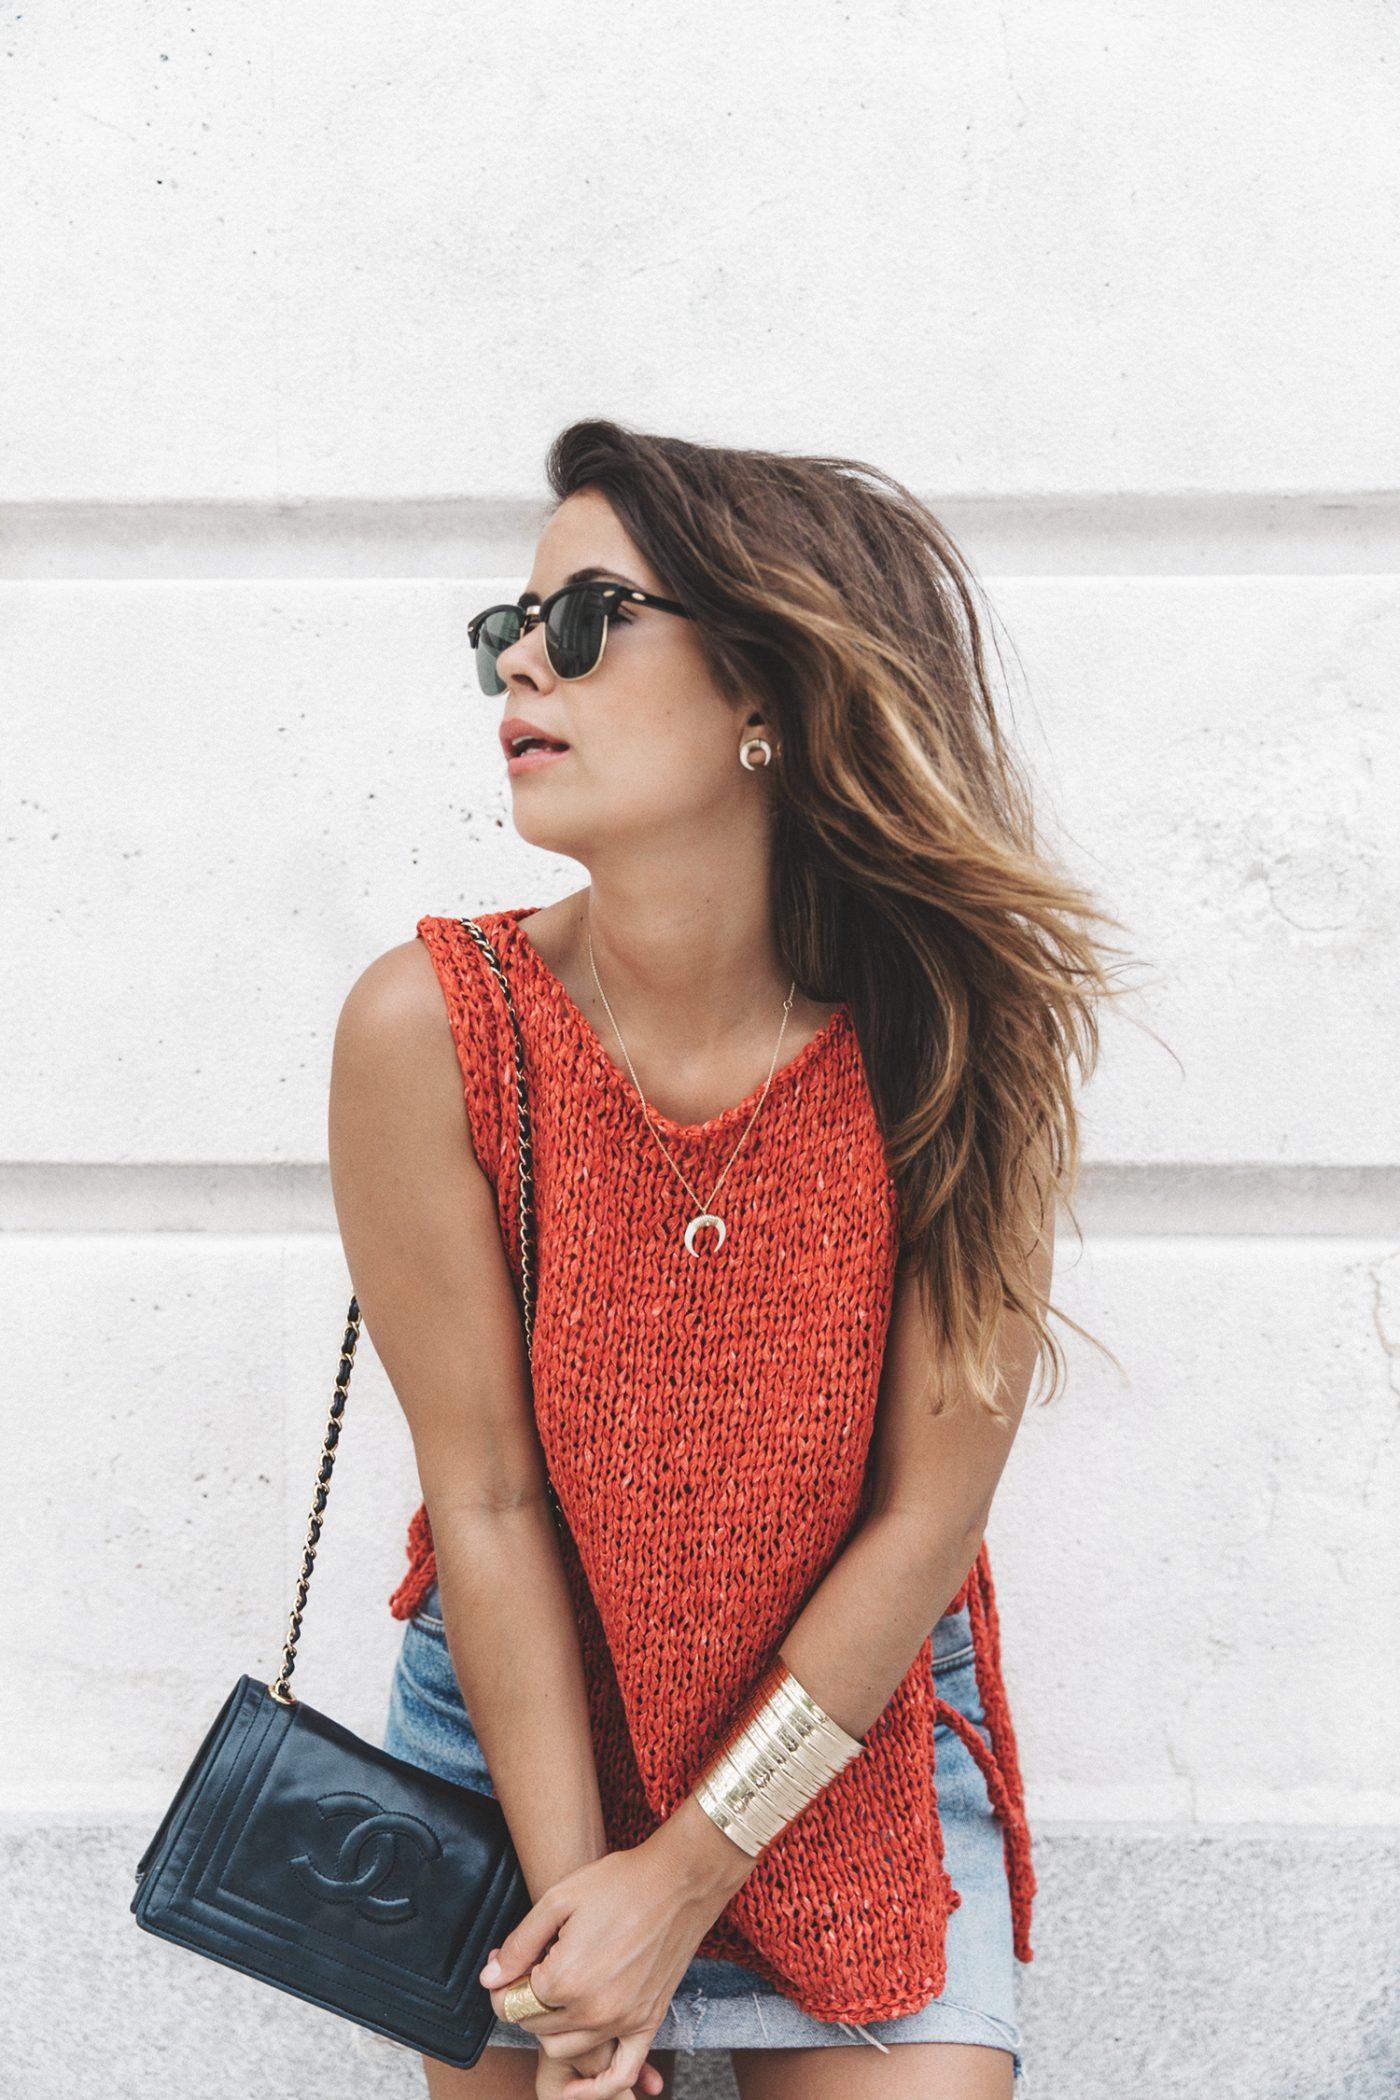 Summery_knit-Levis_Vintage_Skirt-Zalando_Espadrilles-Black_Sandals-Collage_Vintage_Horn_Necklace-Outfit-Street_Style-24